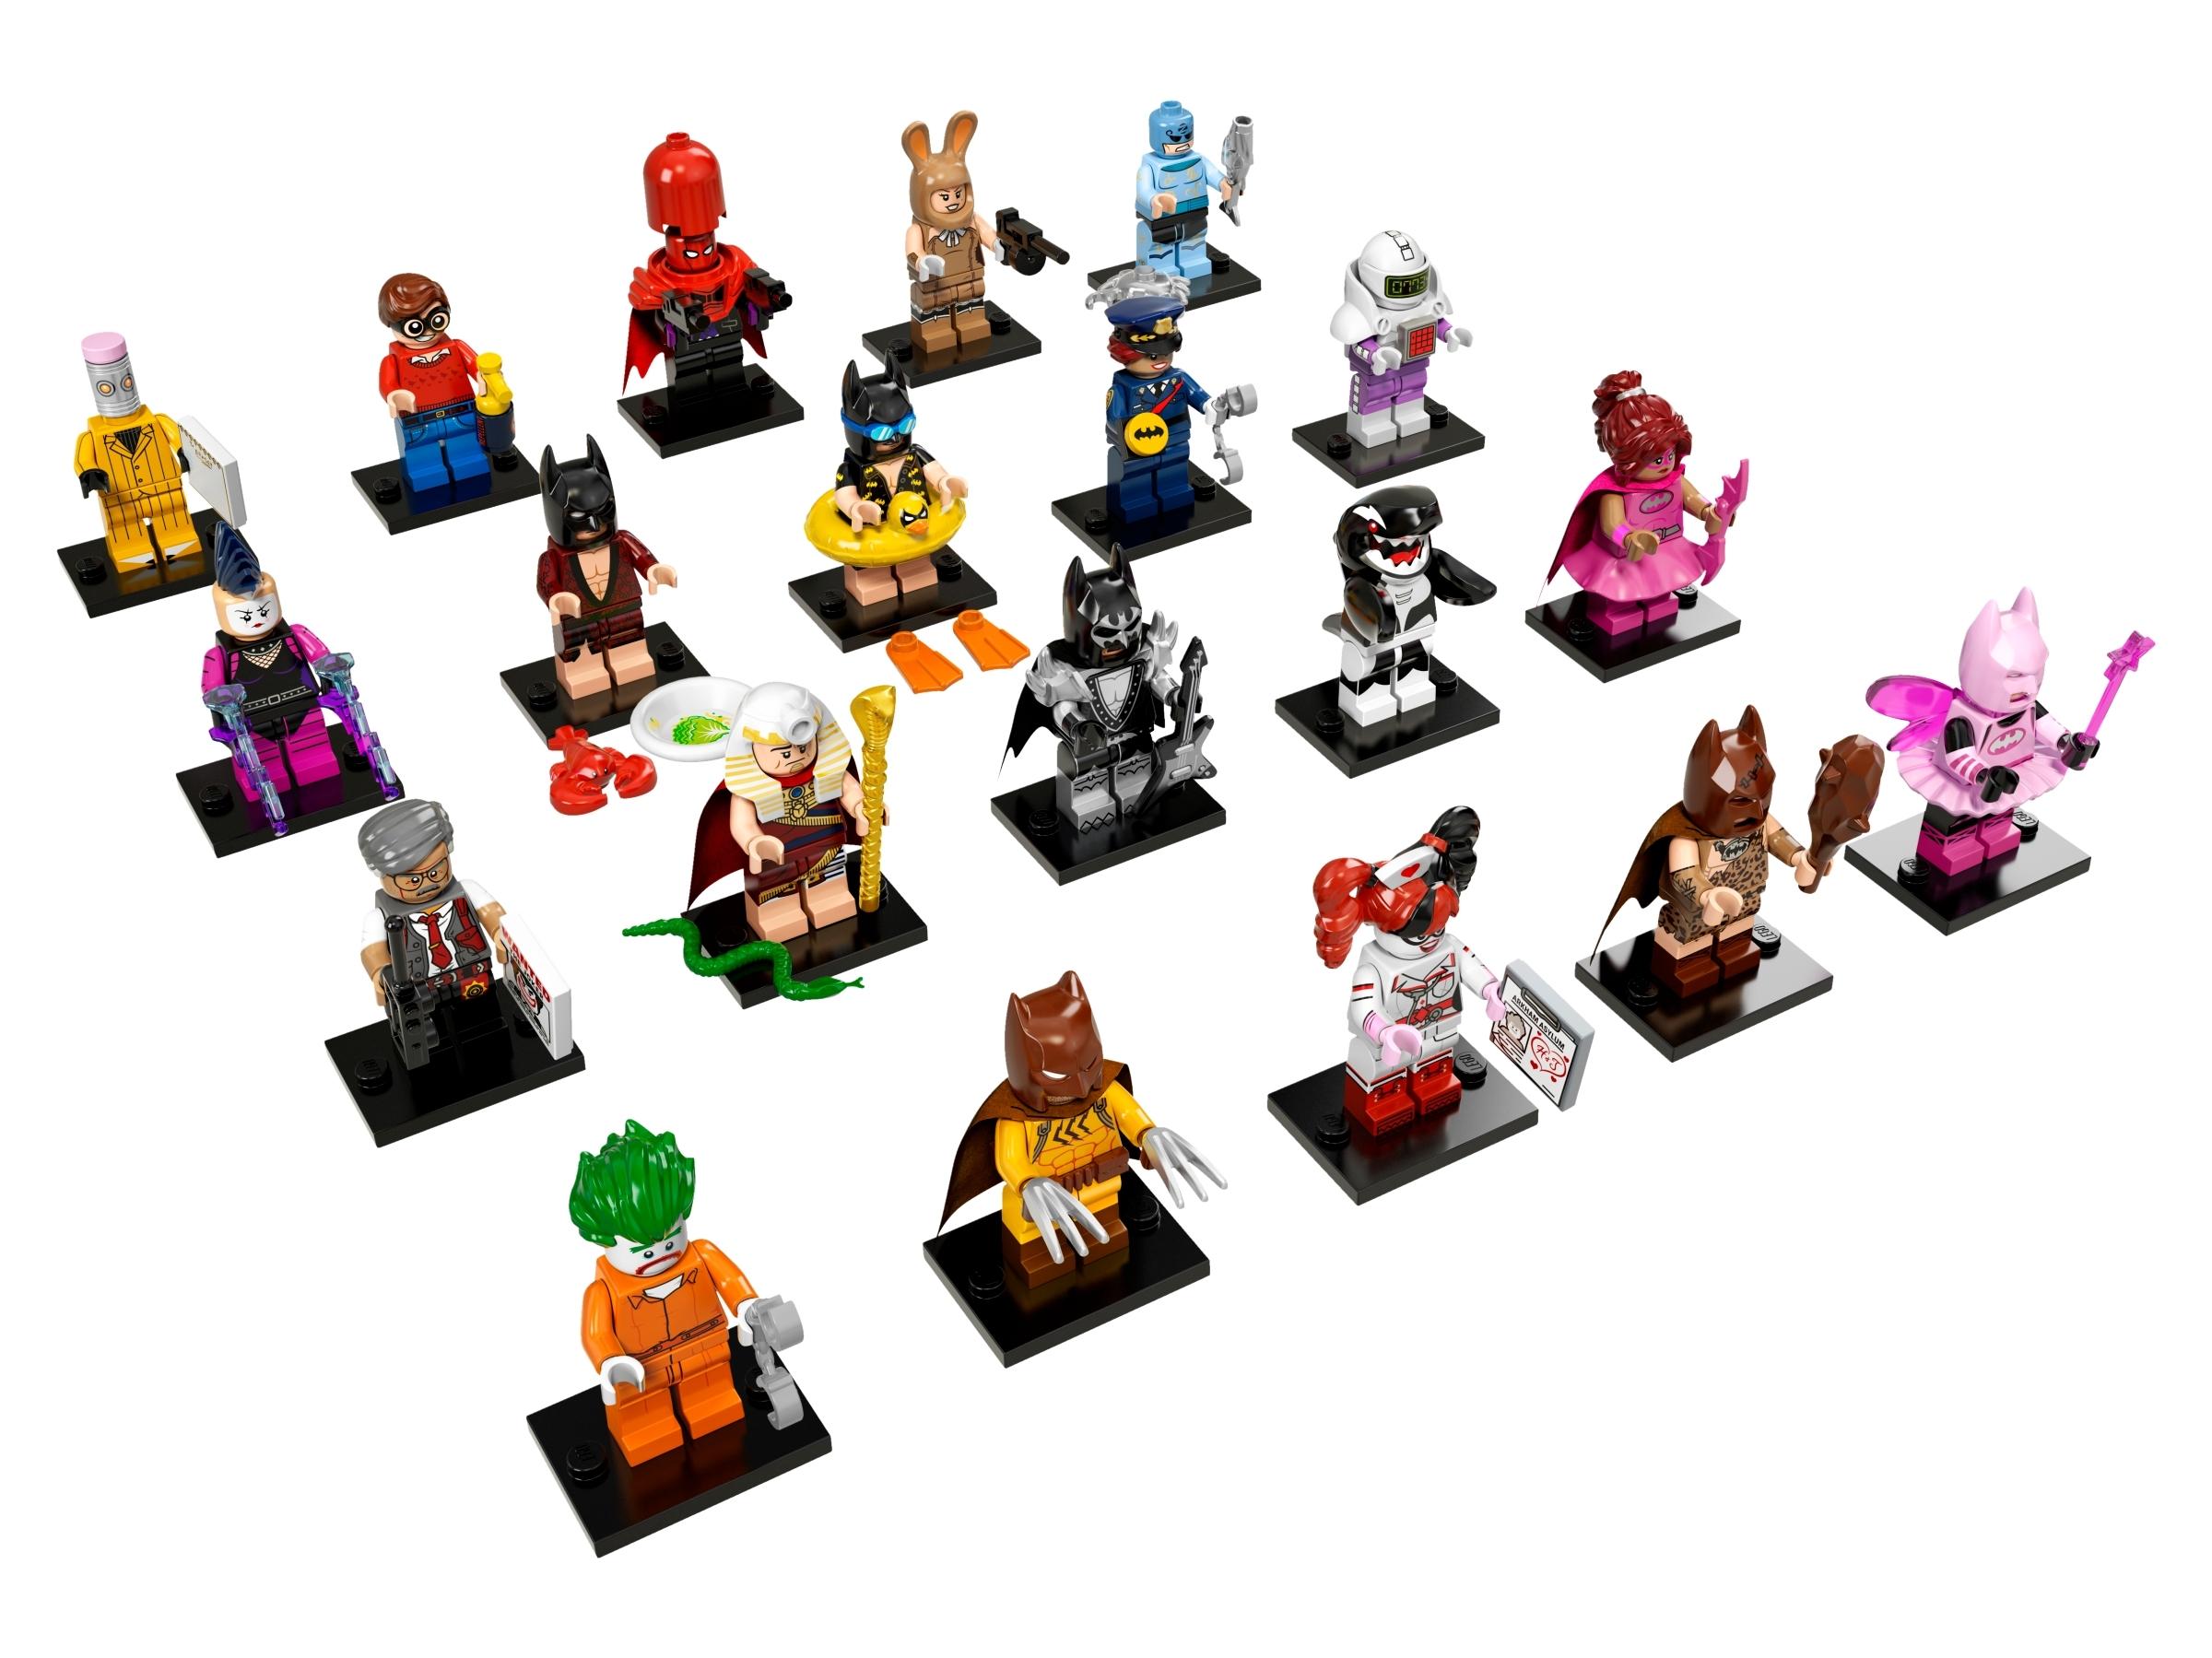 LEGO THE BATMAN MOVIE VACATION BATMAN # 5 MINI FIGURE # 71017 FREE SHIPPING